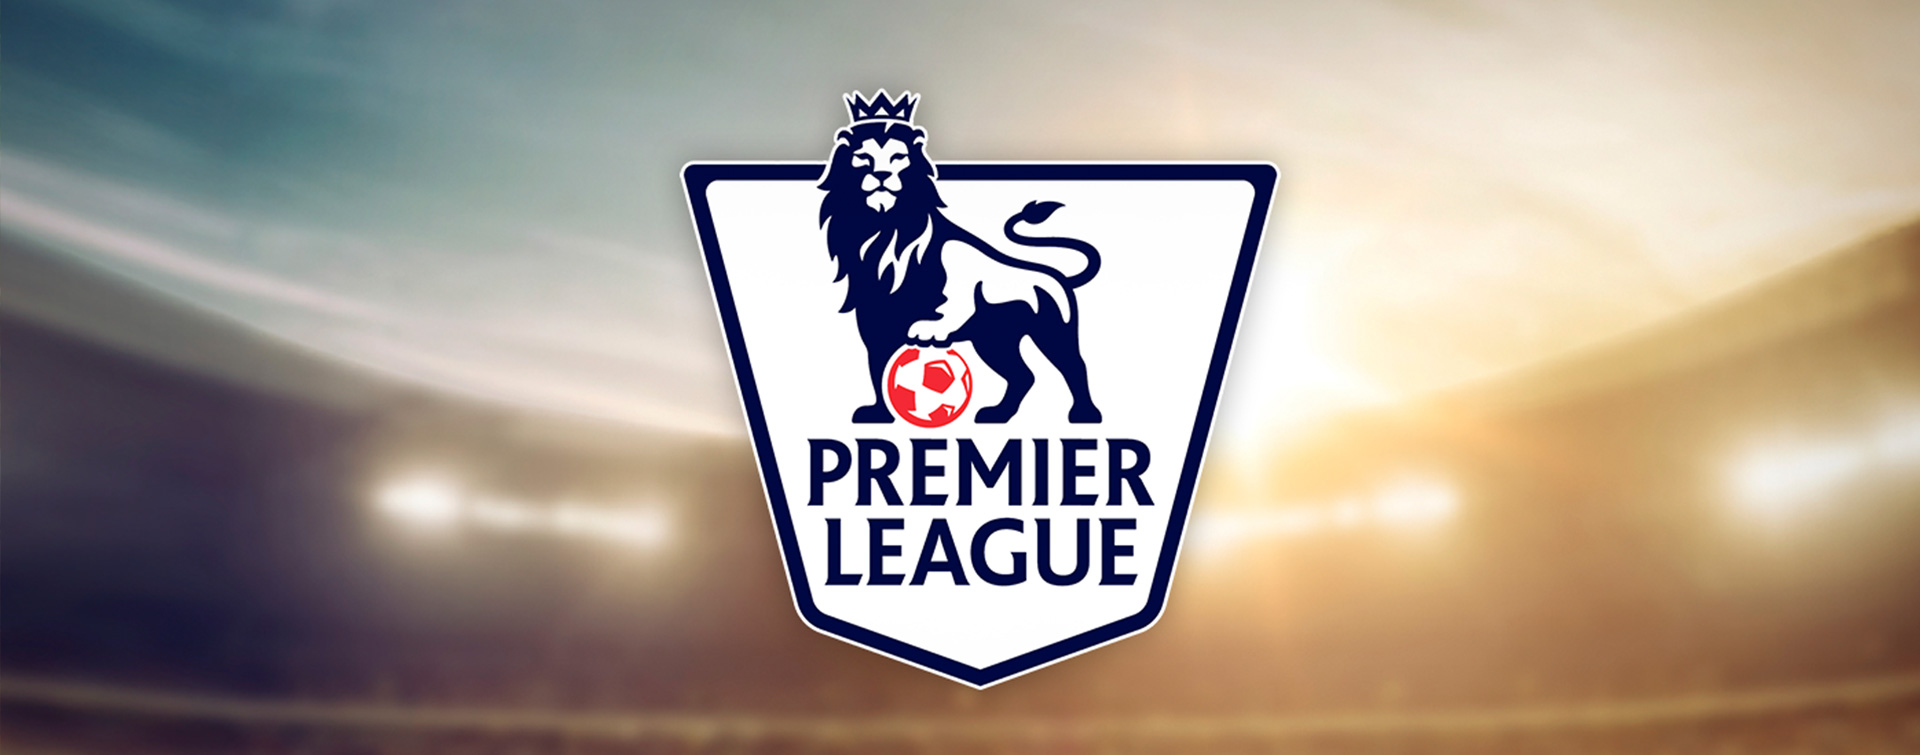 premier-league-header2